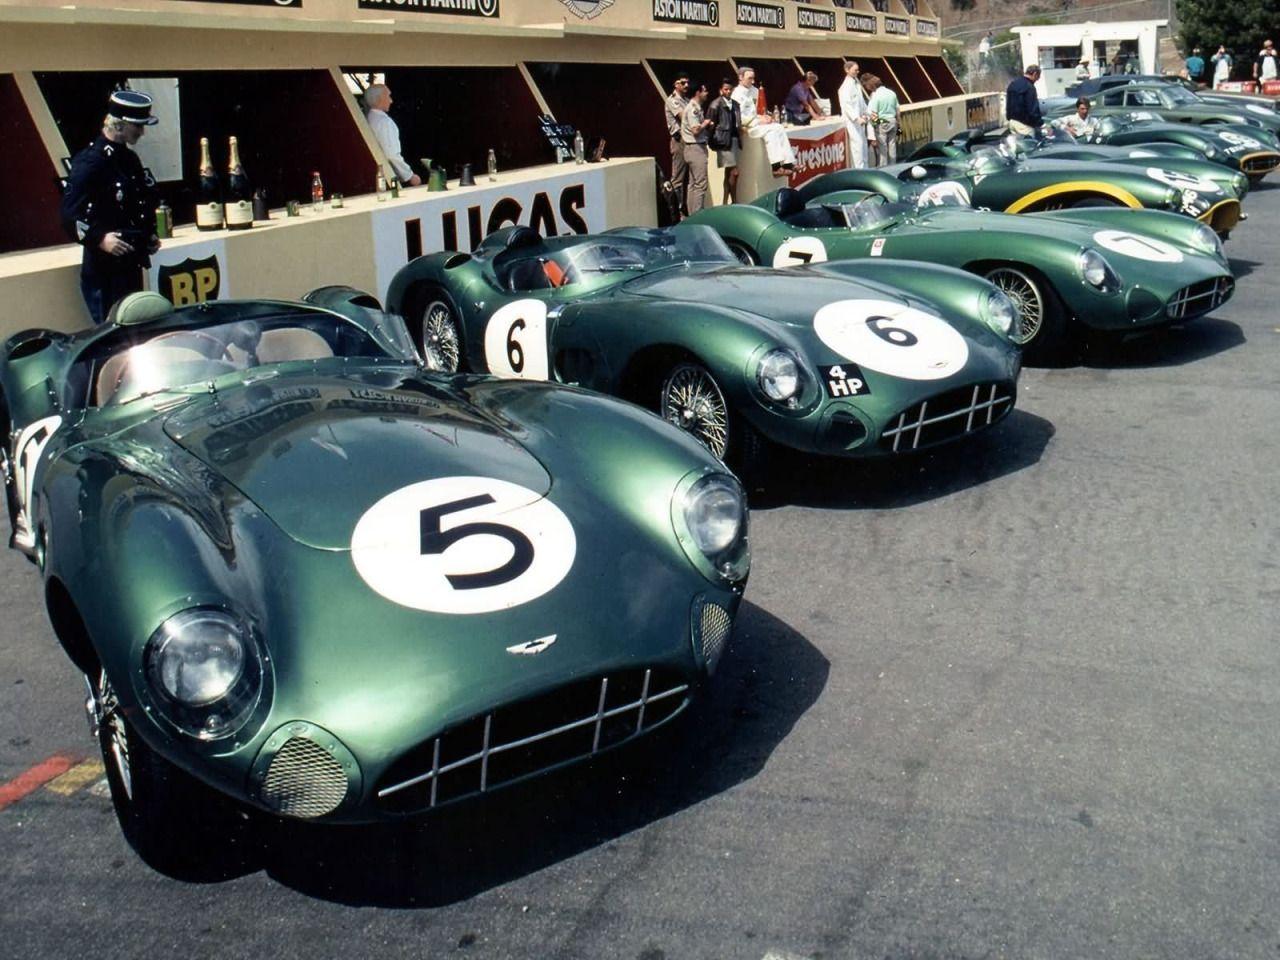 Top Vehicles 1959 Aston Martin Le Mans Team Aston Martin Dbr1 Aston Martin Aston Martin Cars